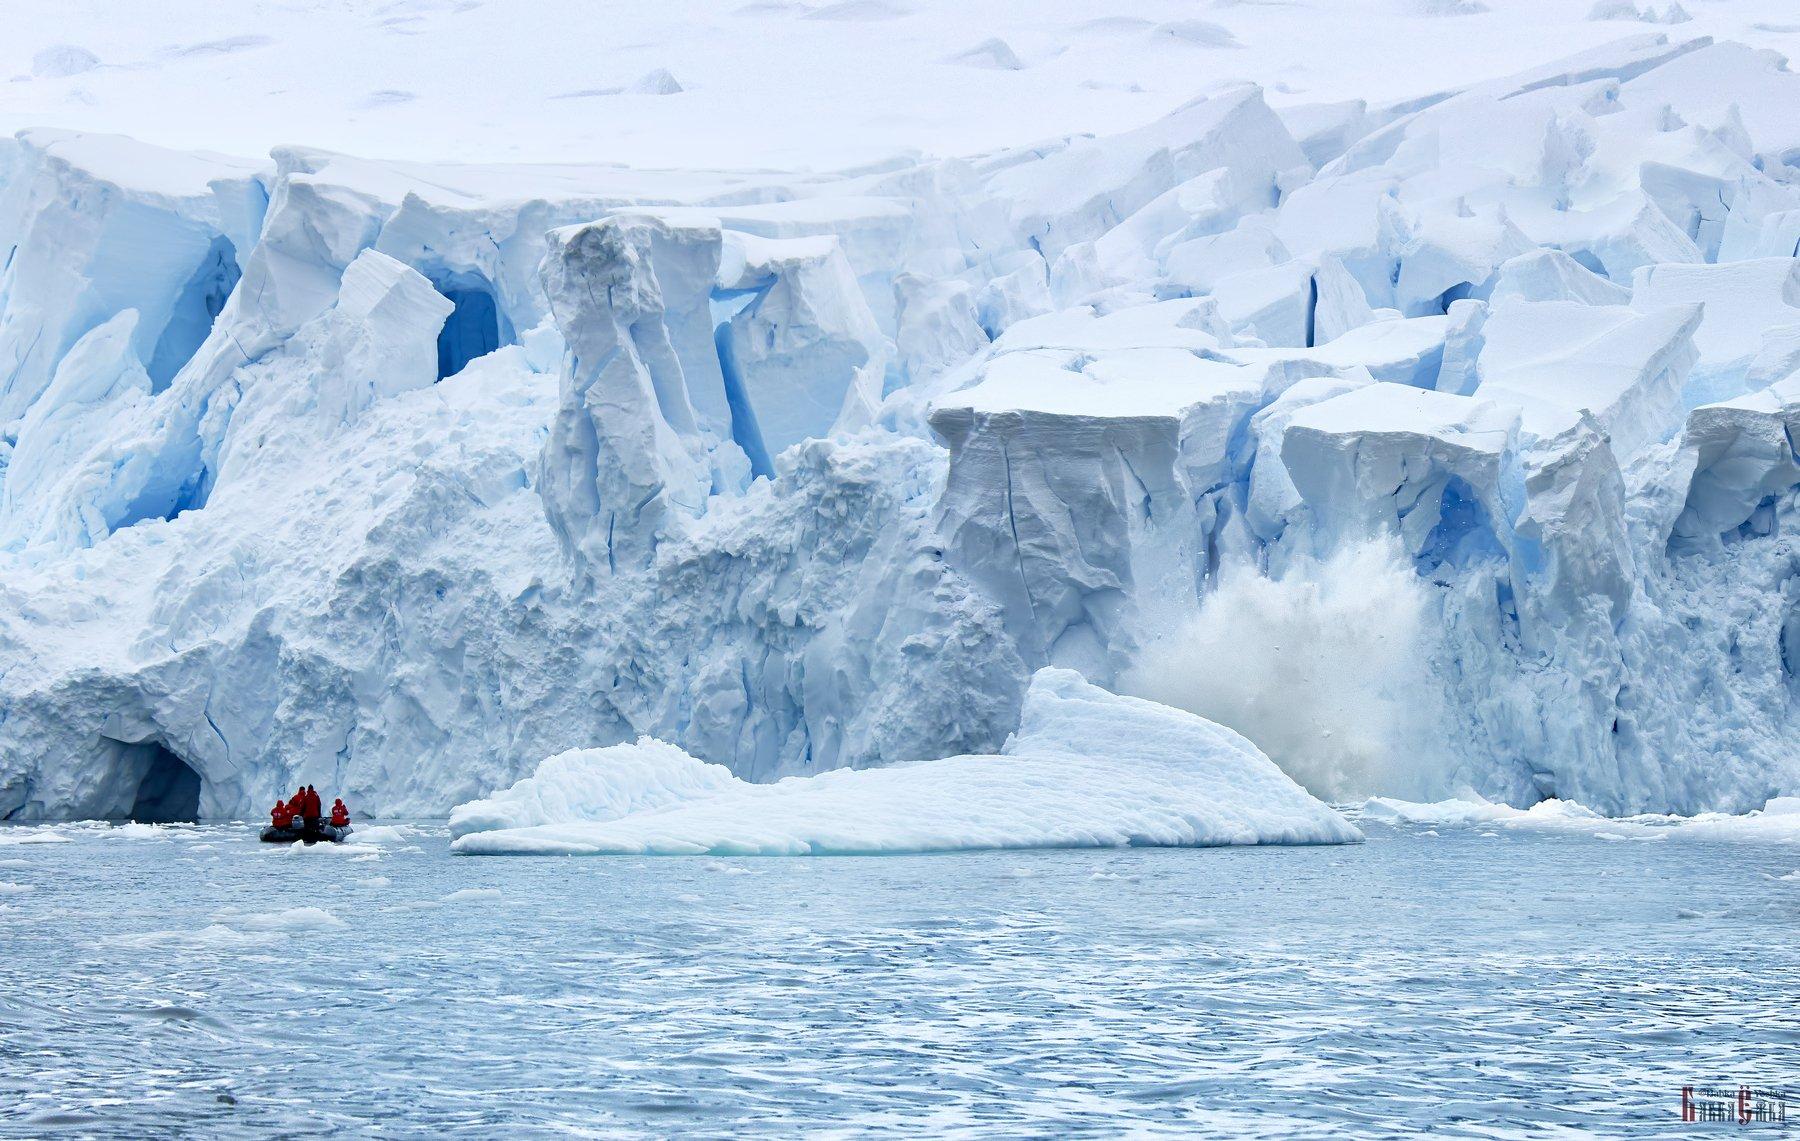 Antarctic, boat, ocean, zodiac, danger, ice, mountains, breaking ice, splash, Babka Yoshka (в миру - Сергей)